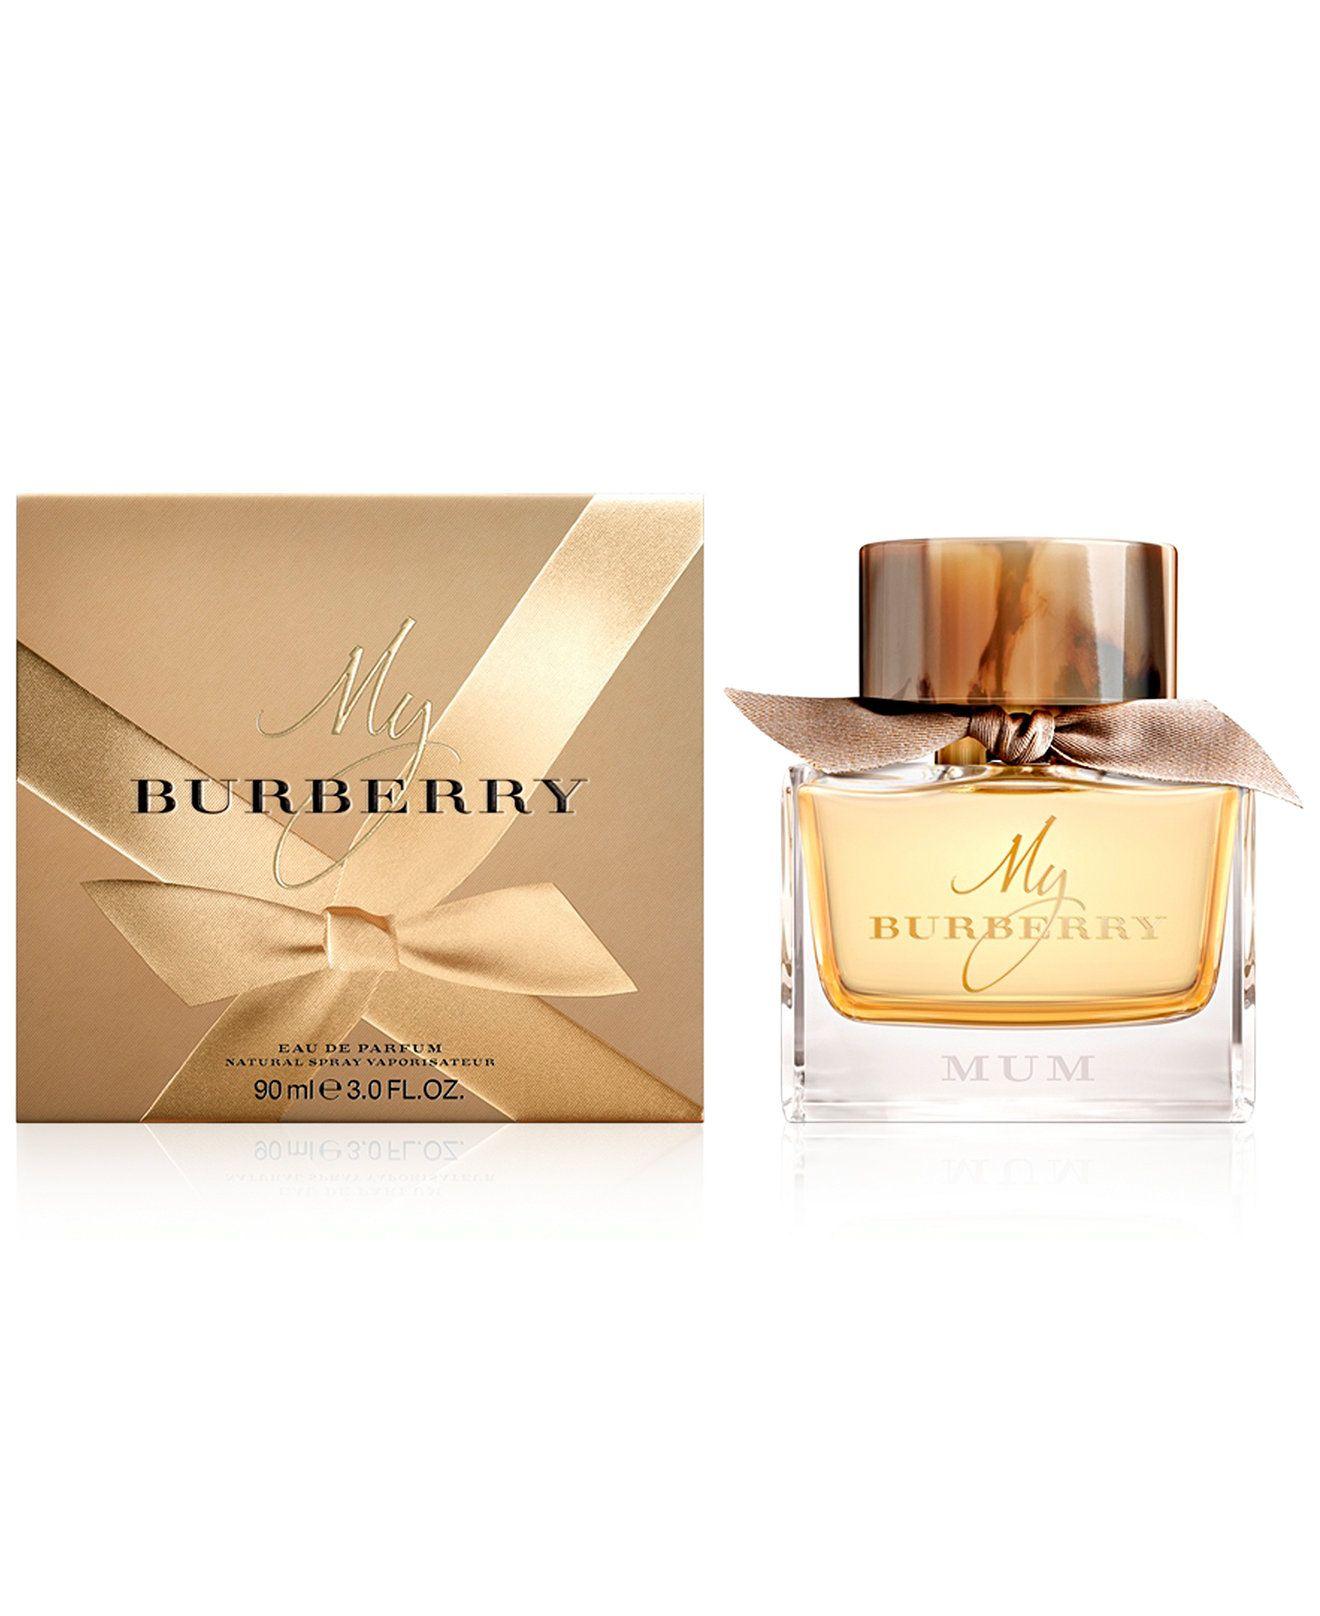 Burberry My Burberry Eau De Parfum 3 Oz Limited Edition Perfume Beauty Macy S